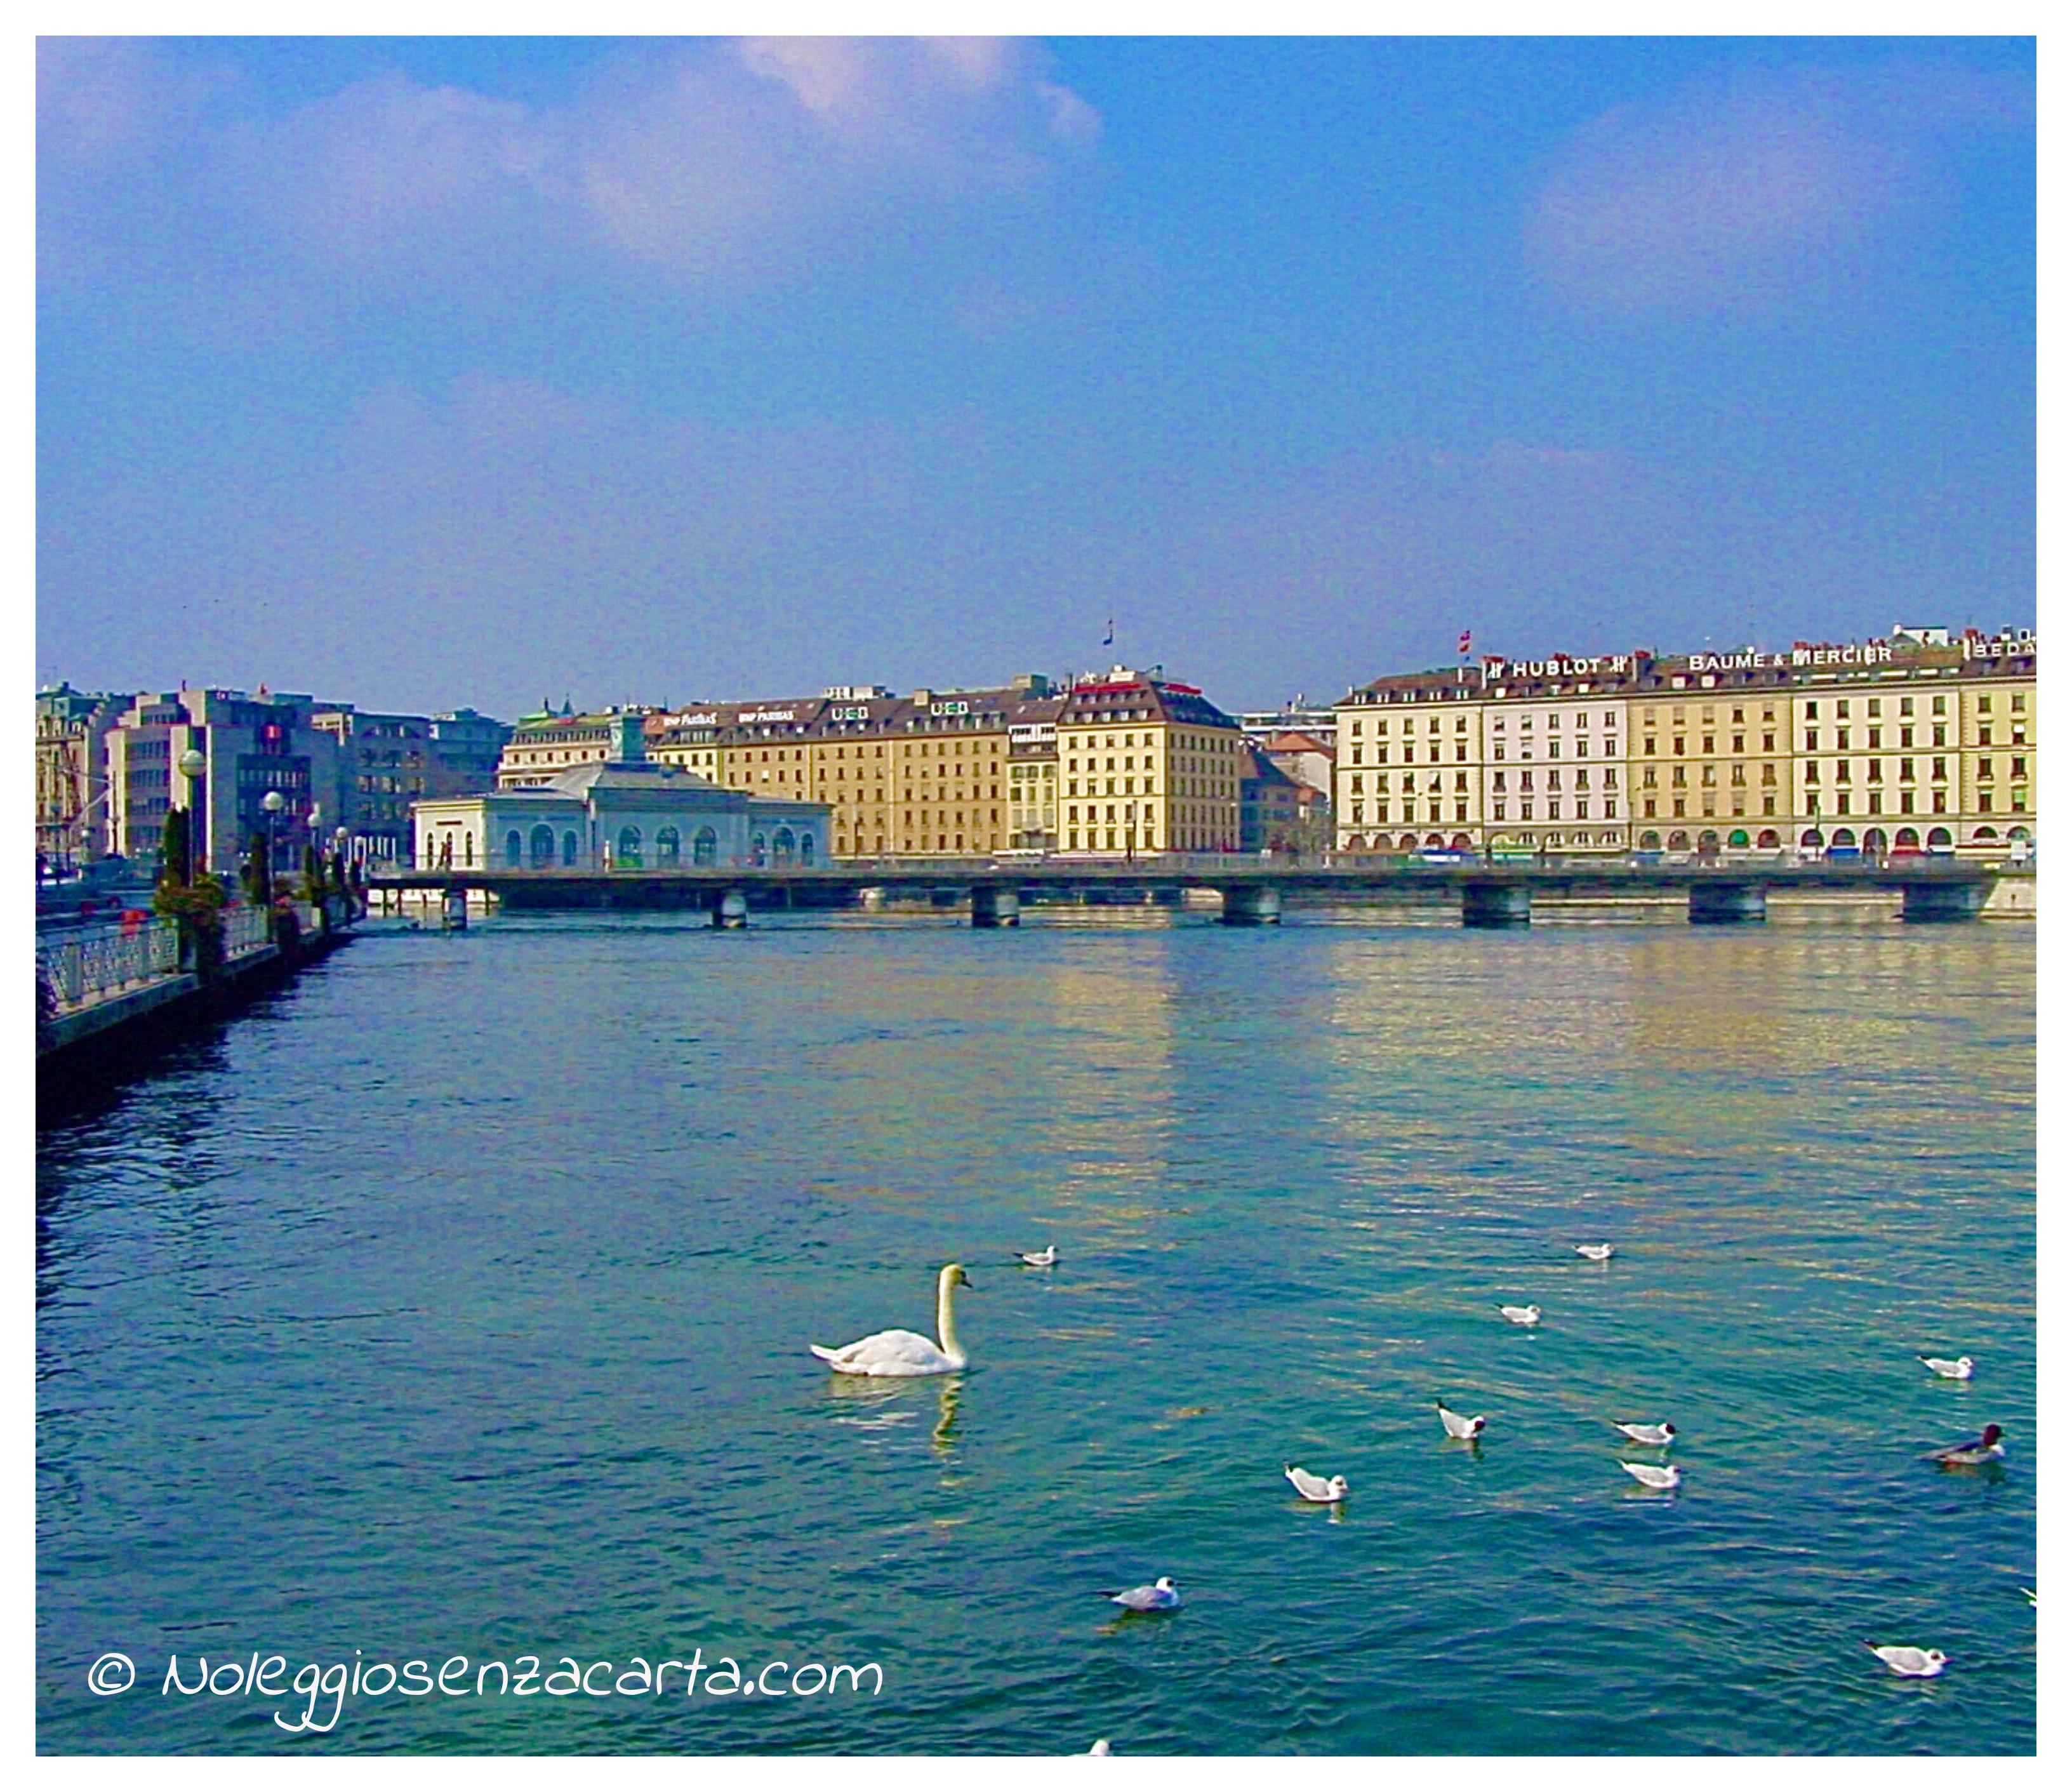 Alquiler coche sin tarjeta de crédito en Ginebra – Suiza